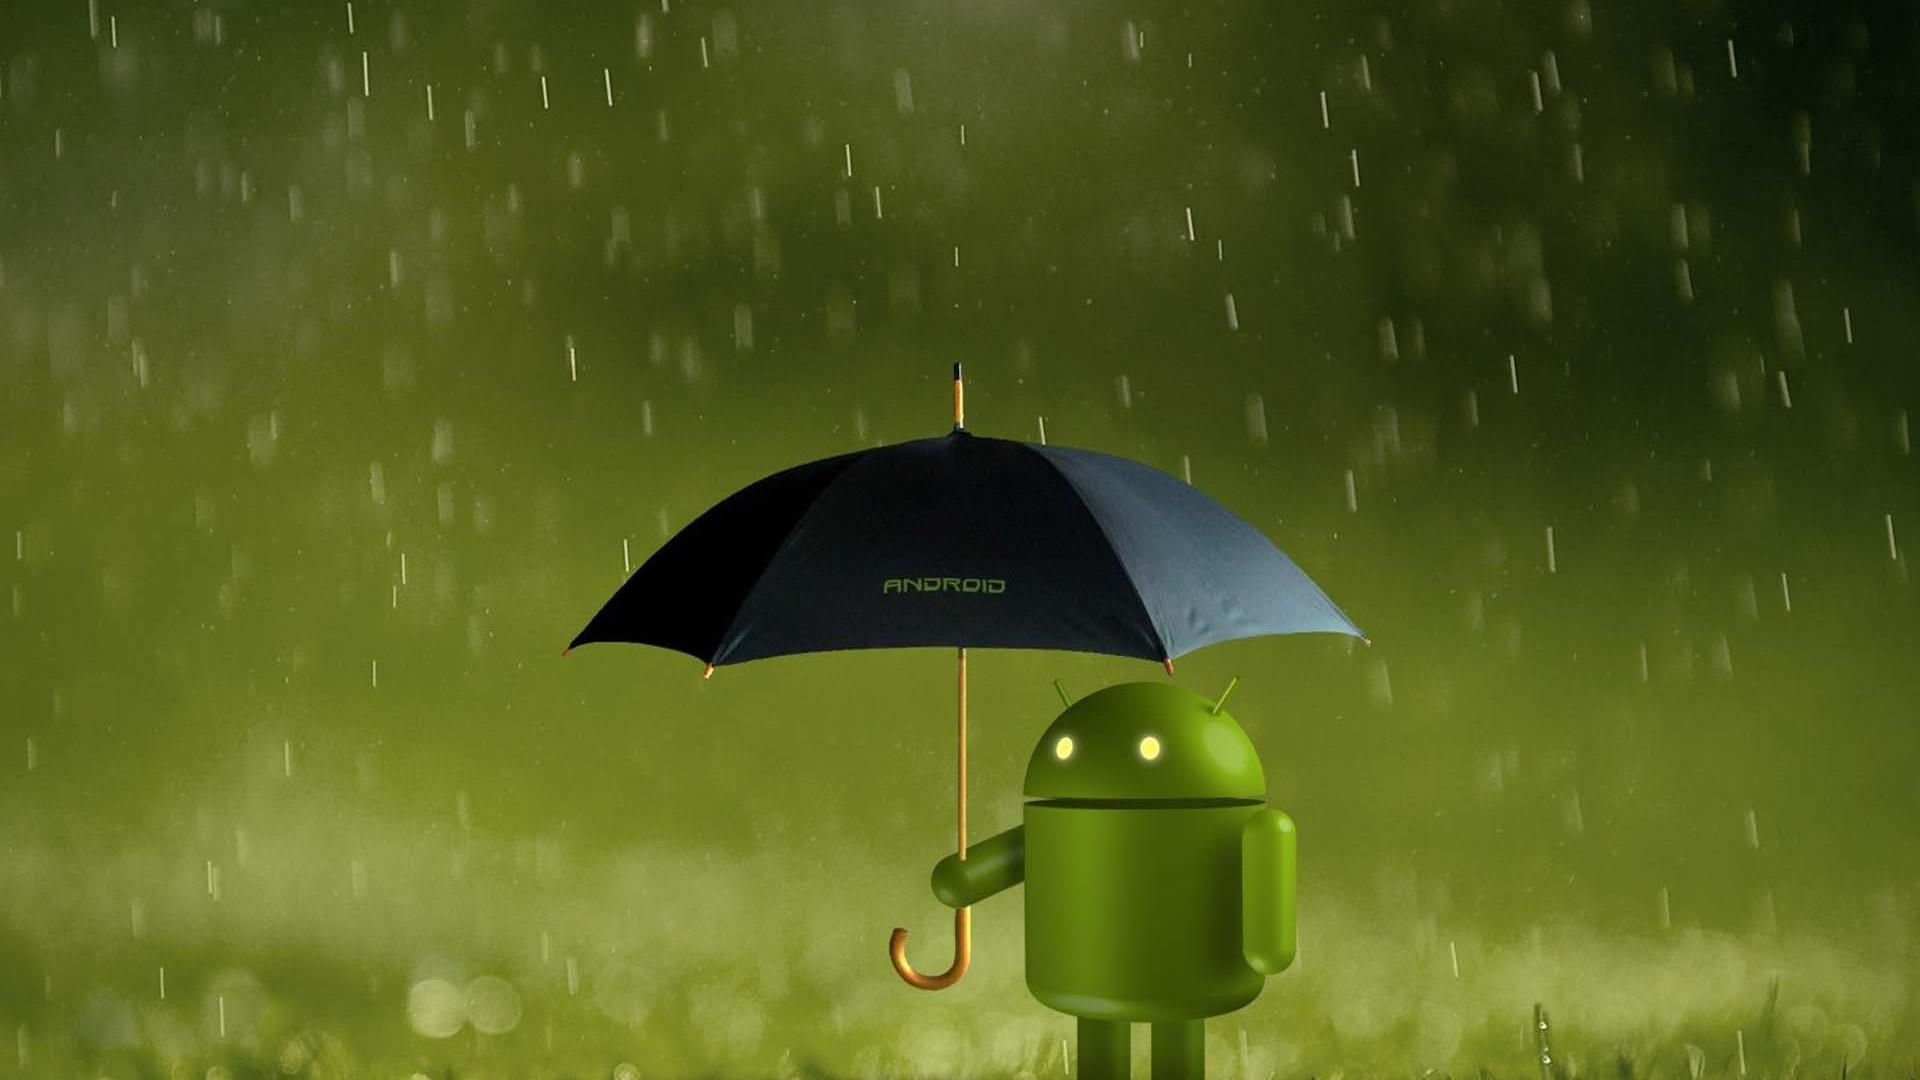 android-rain.jpg